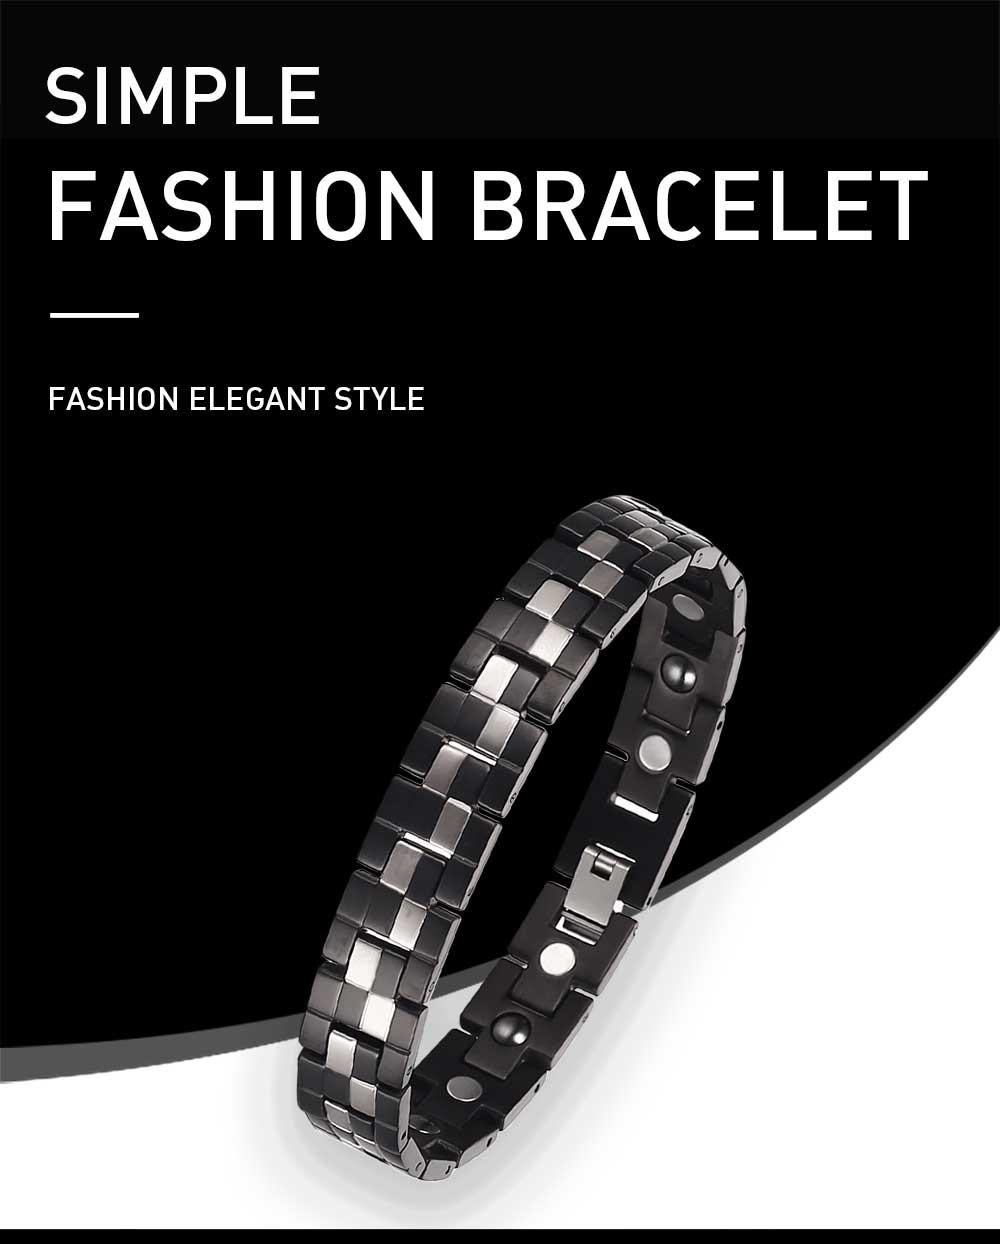 Moocare fashion men's magnet energy bracelet health magnetic therapy health jewelry pure titanium bracelet